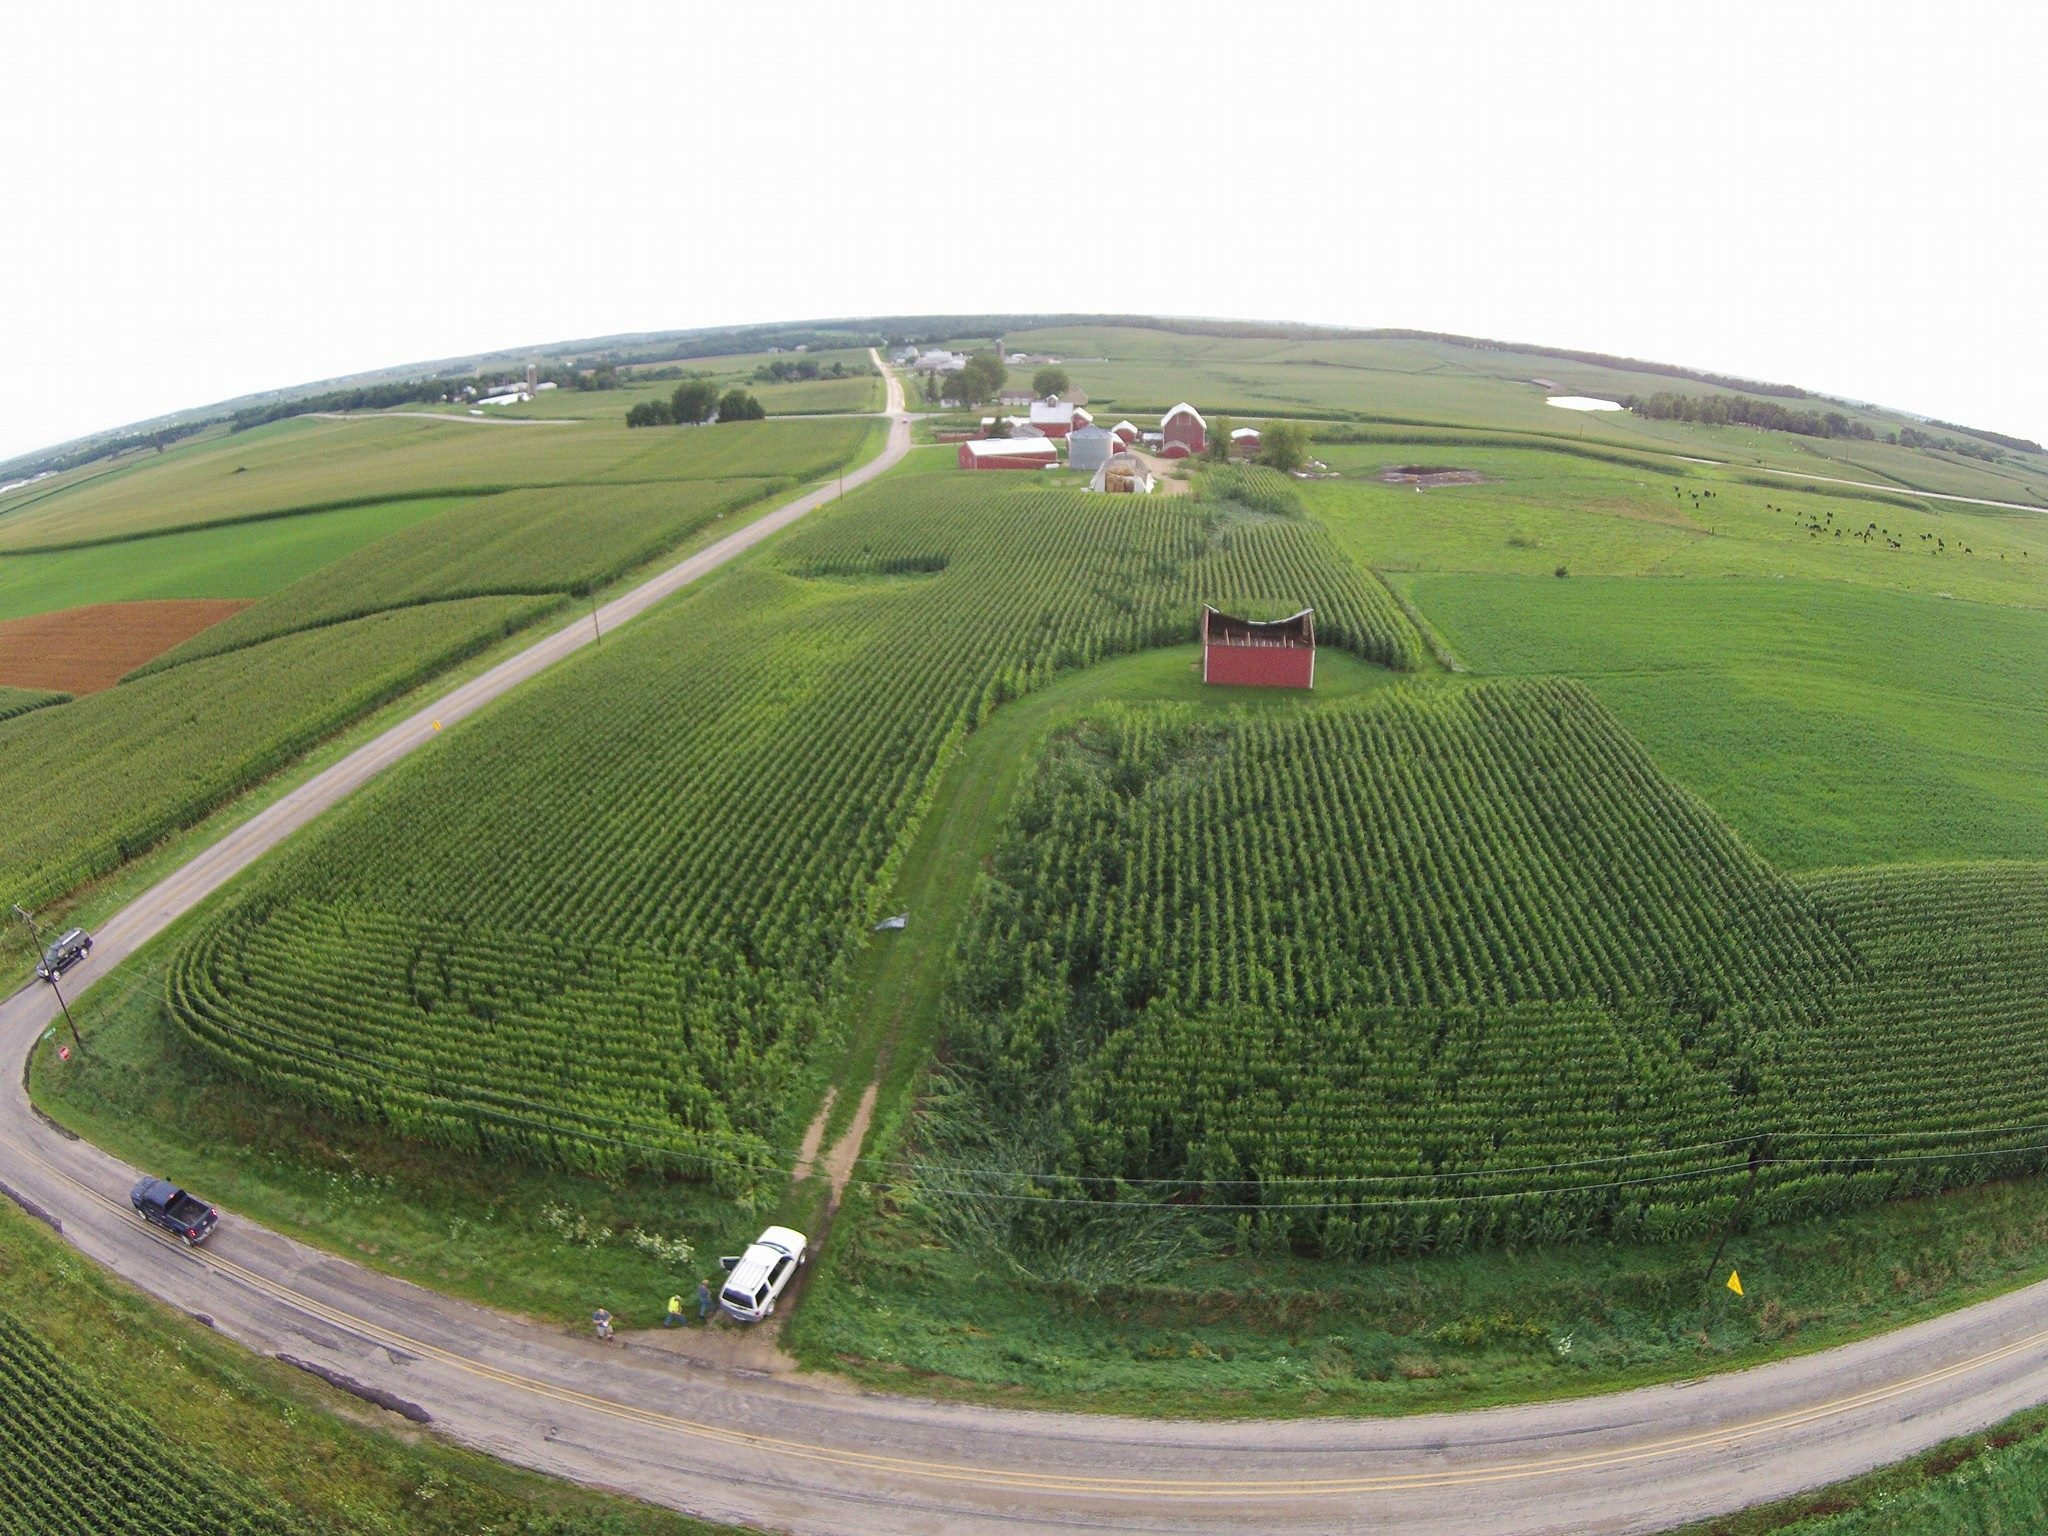 Just north of Worthington, courtesy ScanDBQ Online